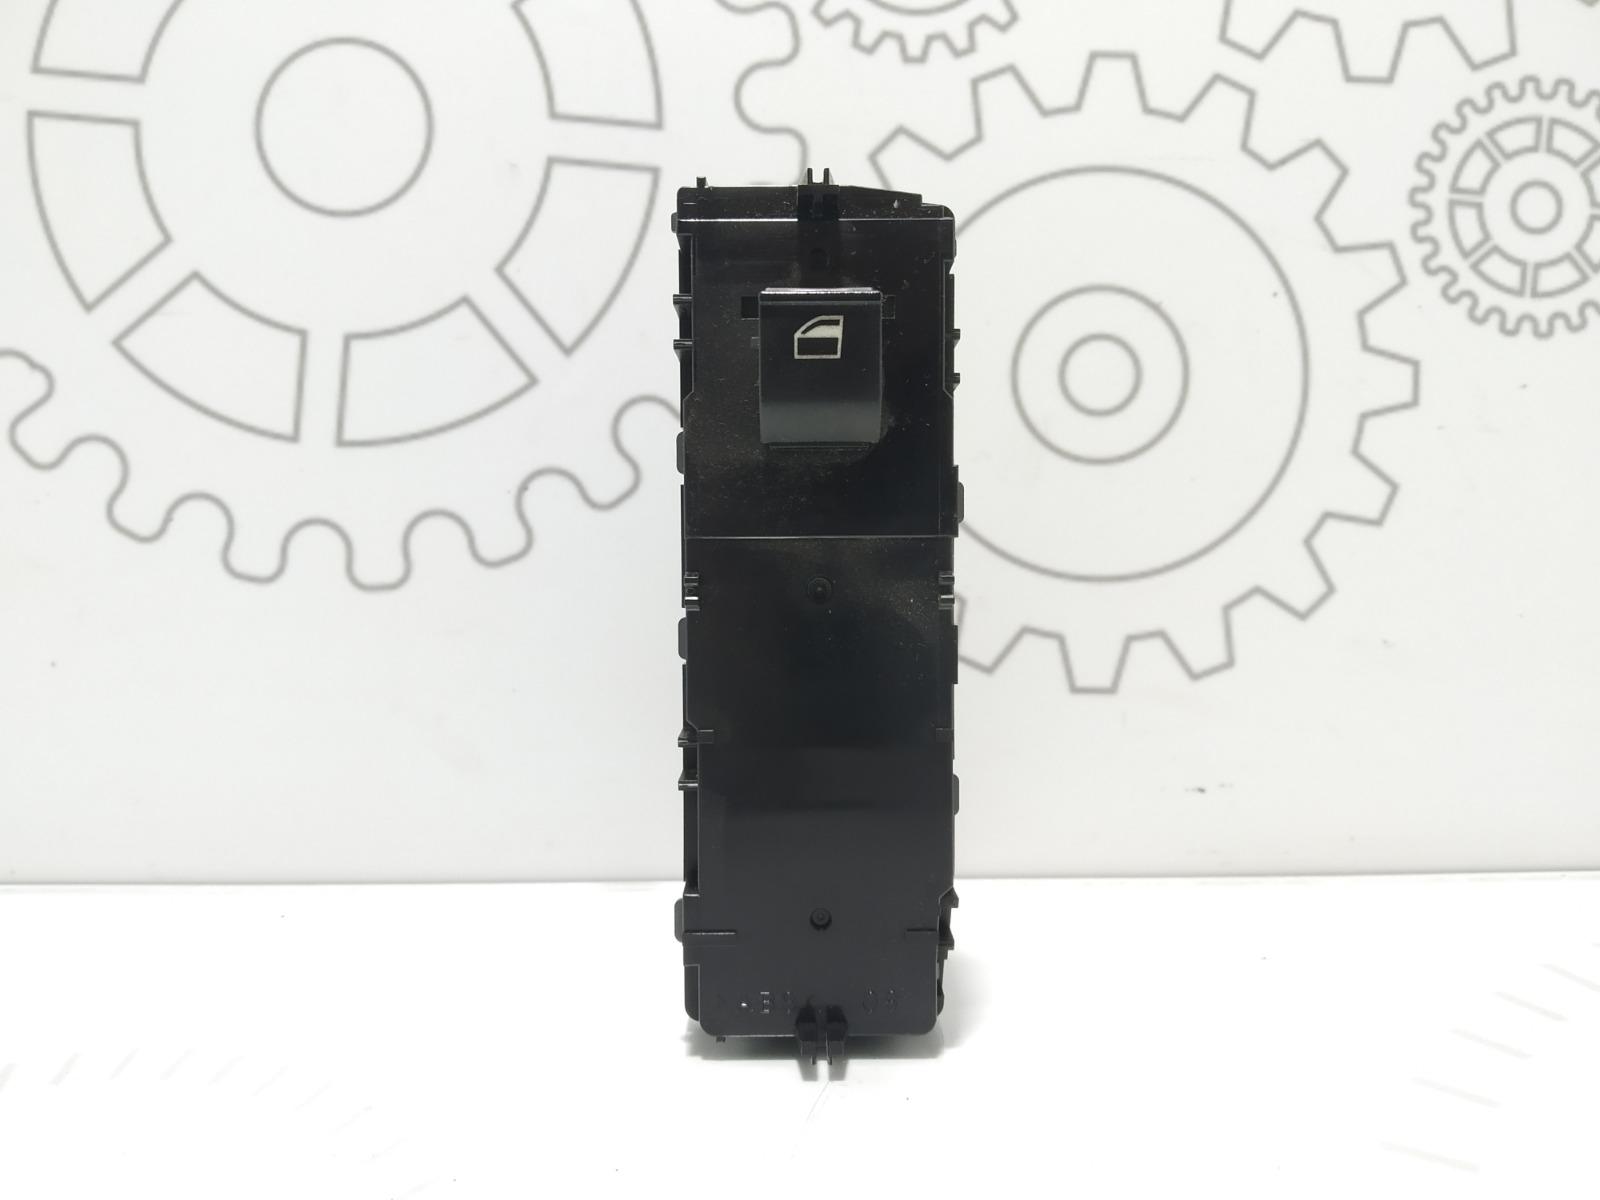 Кнопка стеклоподъемника Bmw X5 E53 3.0 I 2003 (б/у)